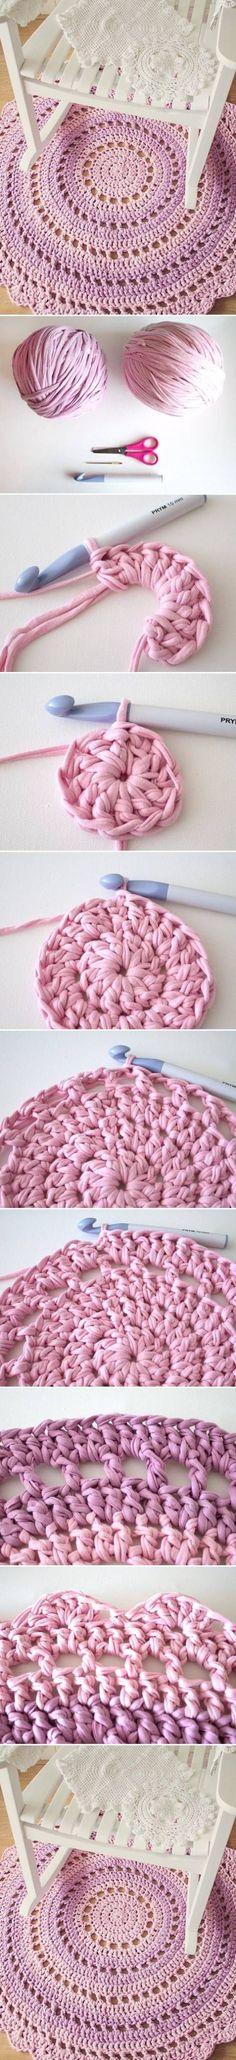 Crochet a circular rug